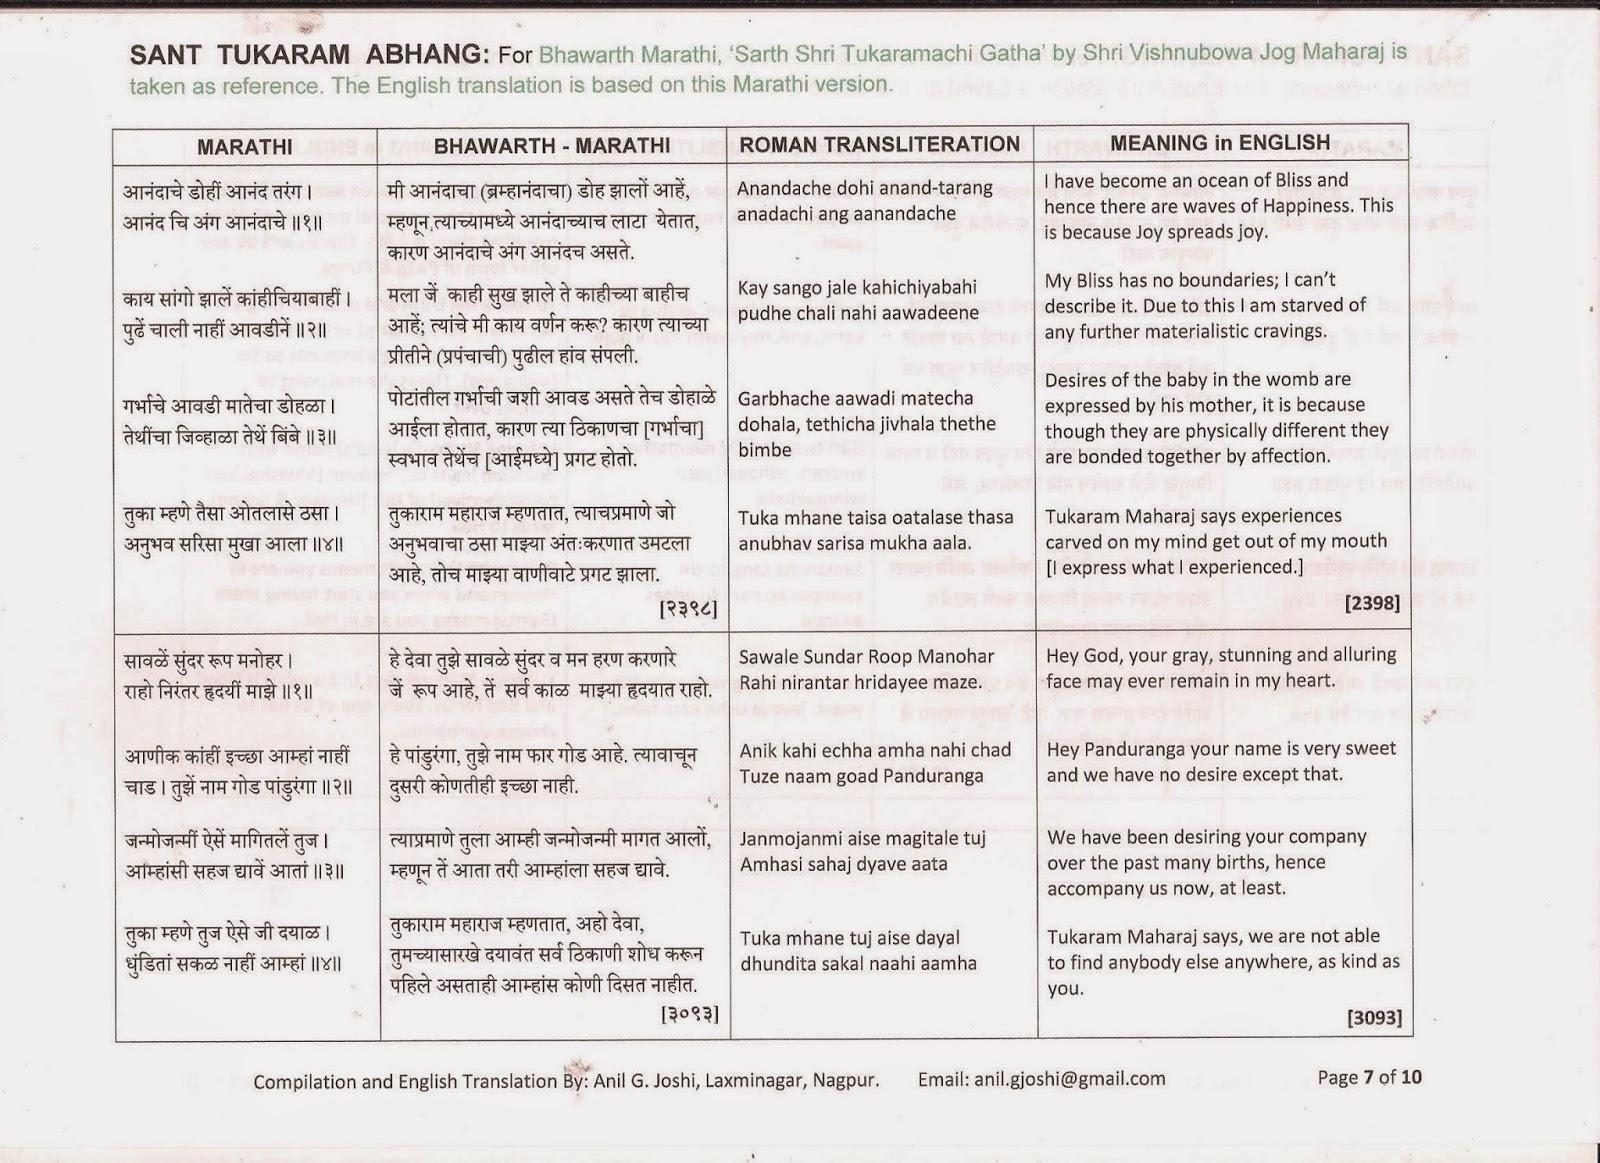 SANT TUKARAM ABHANG IN ENGLISH PDF